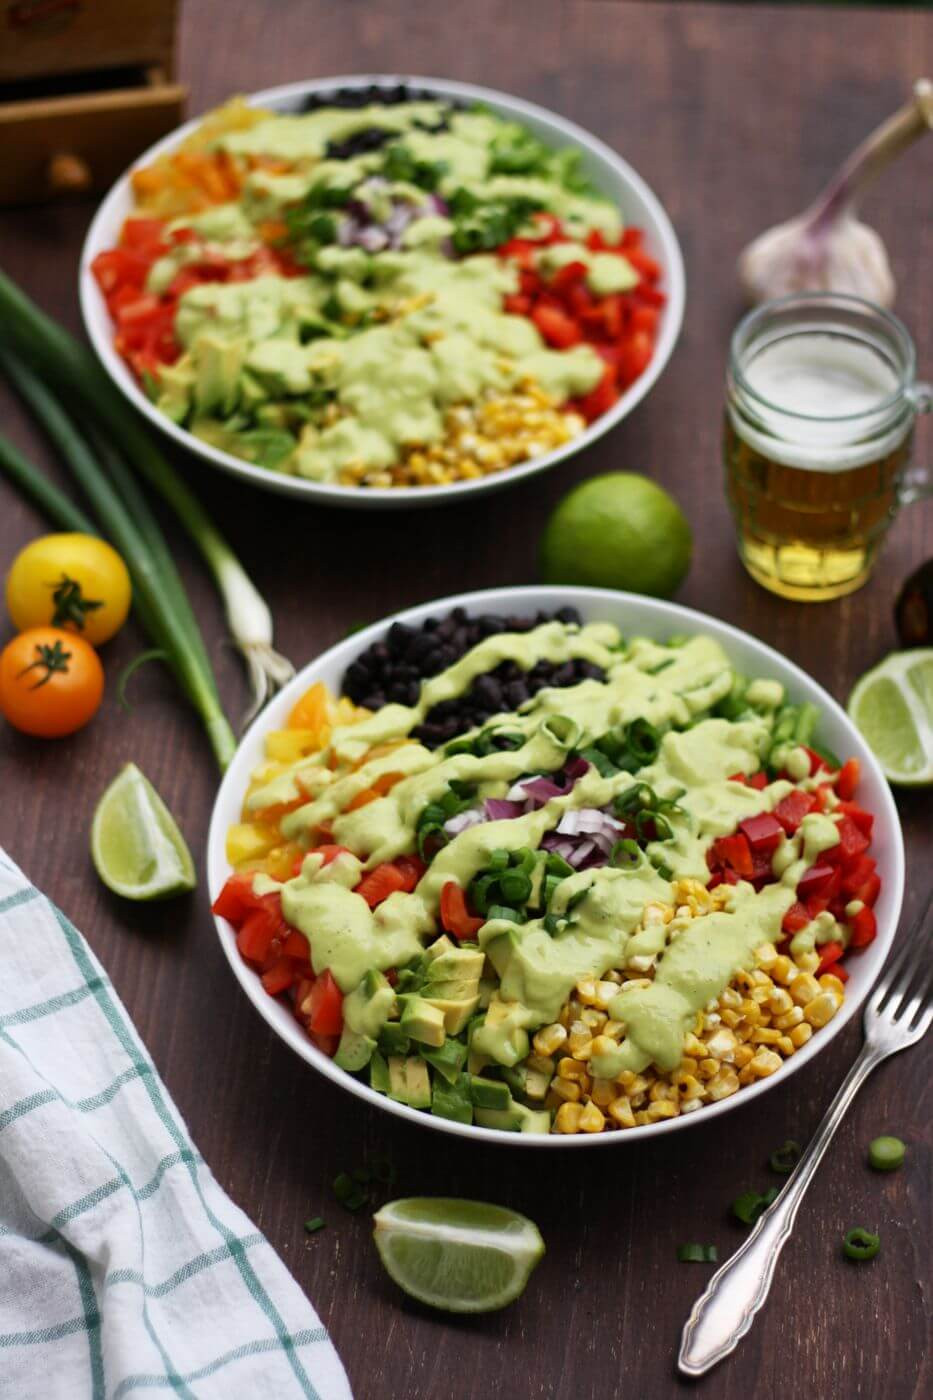 Vegan Mexican Recipes  Vegan Mexican Chopped Salad with Avocado Dressing • Happy